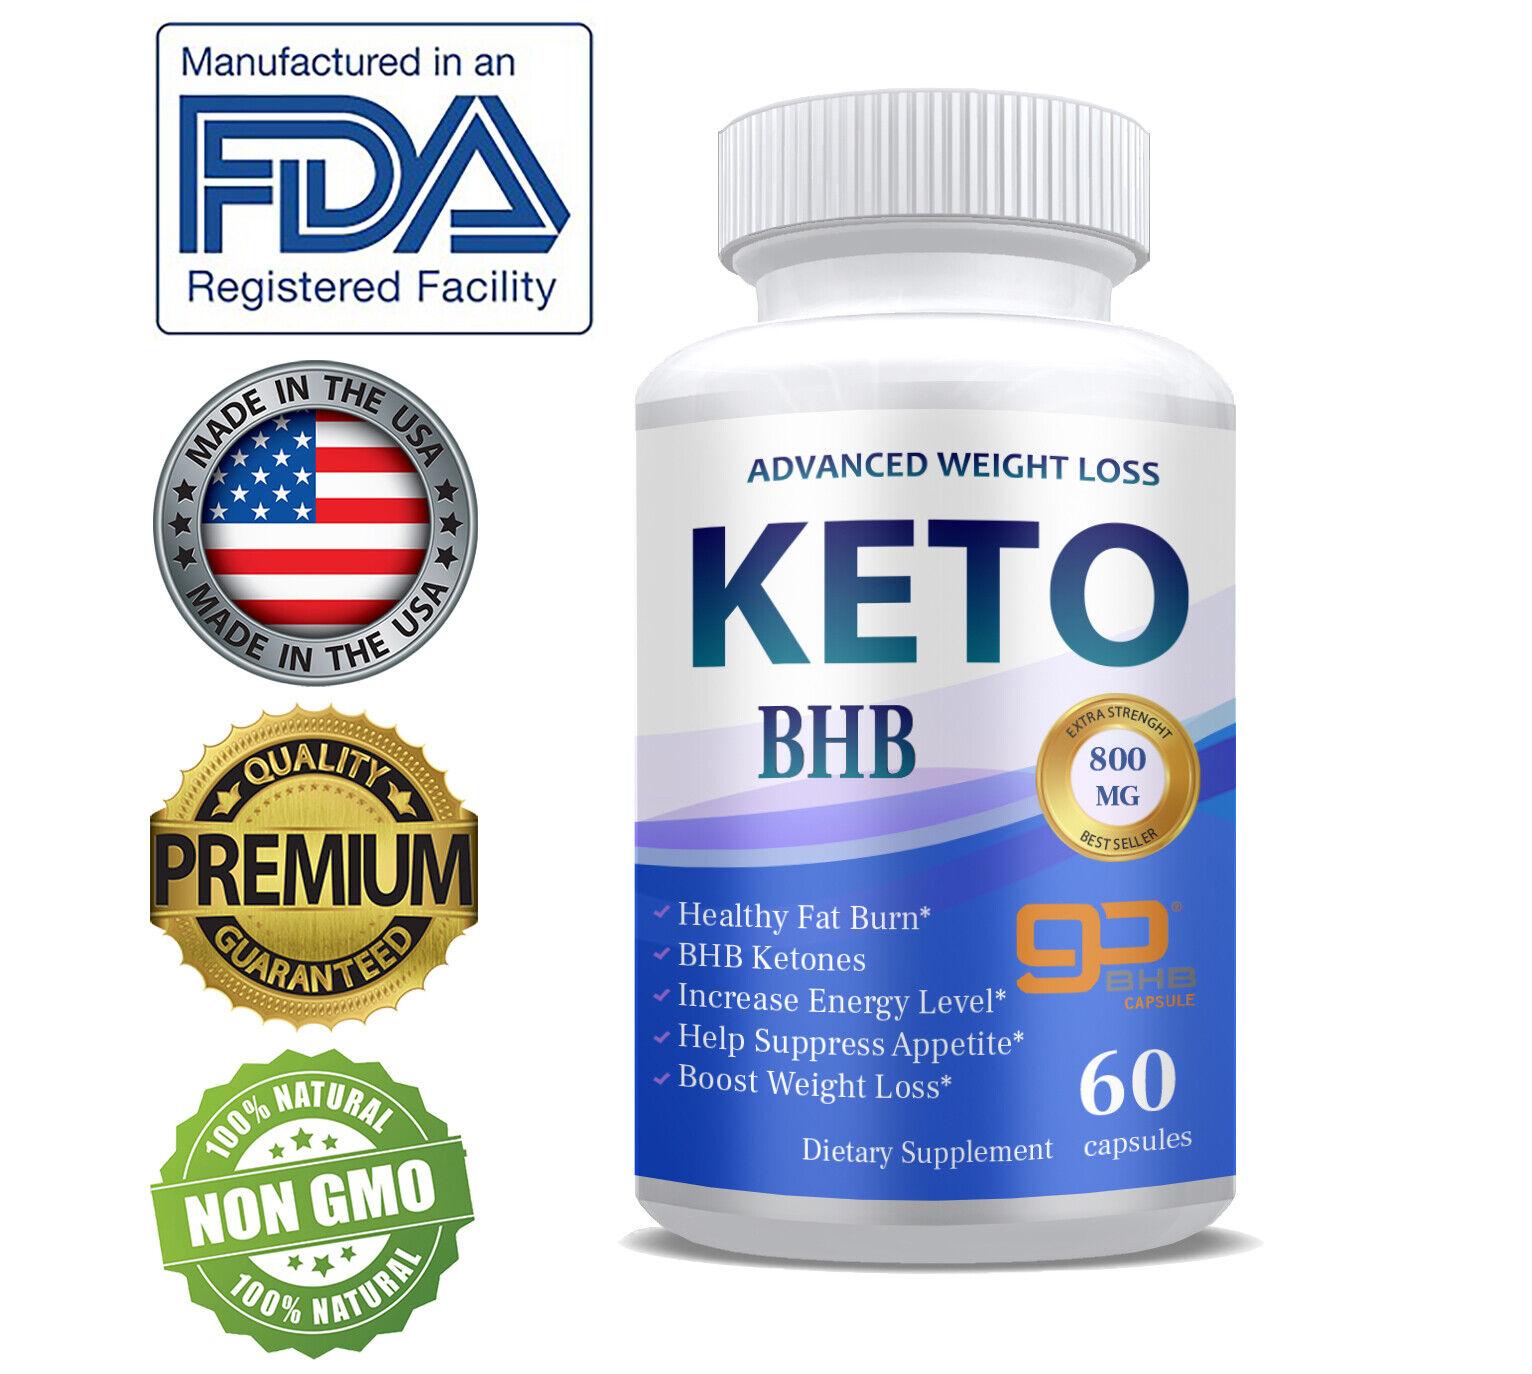 Shark Tank Keto Diet Fat Burn Fast  GO BHB Ketones  Weight Loss Supplement Pills